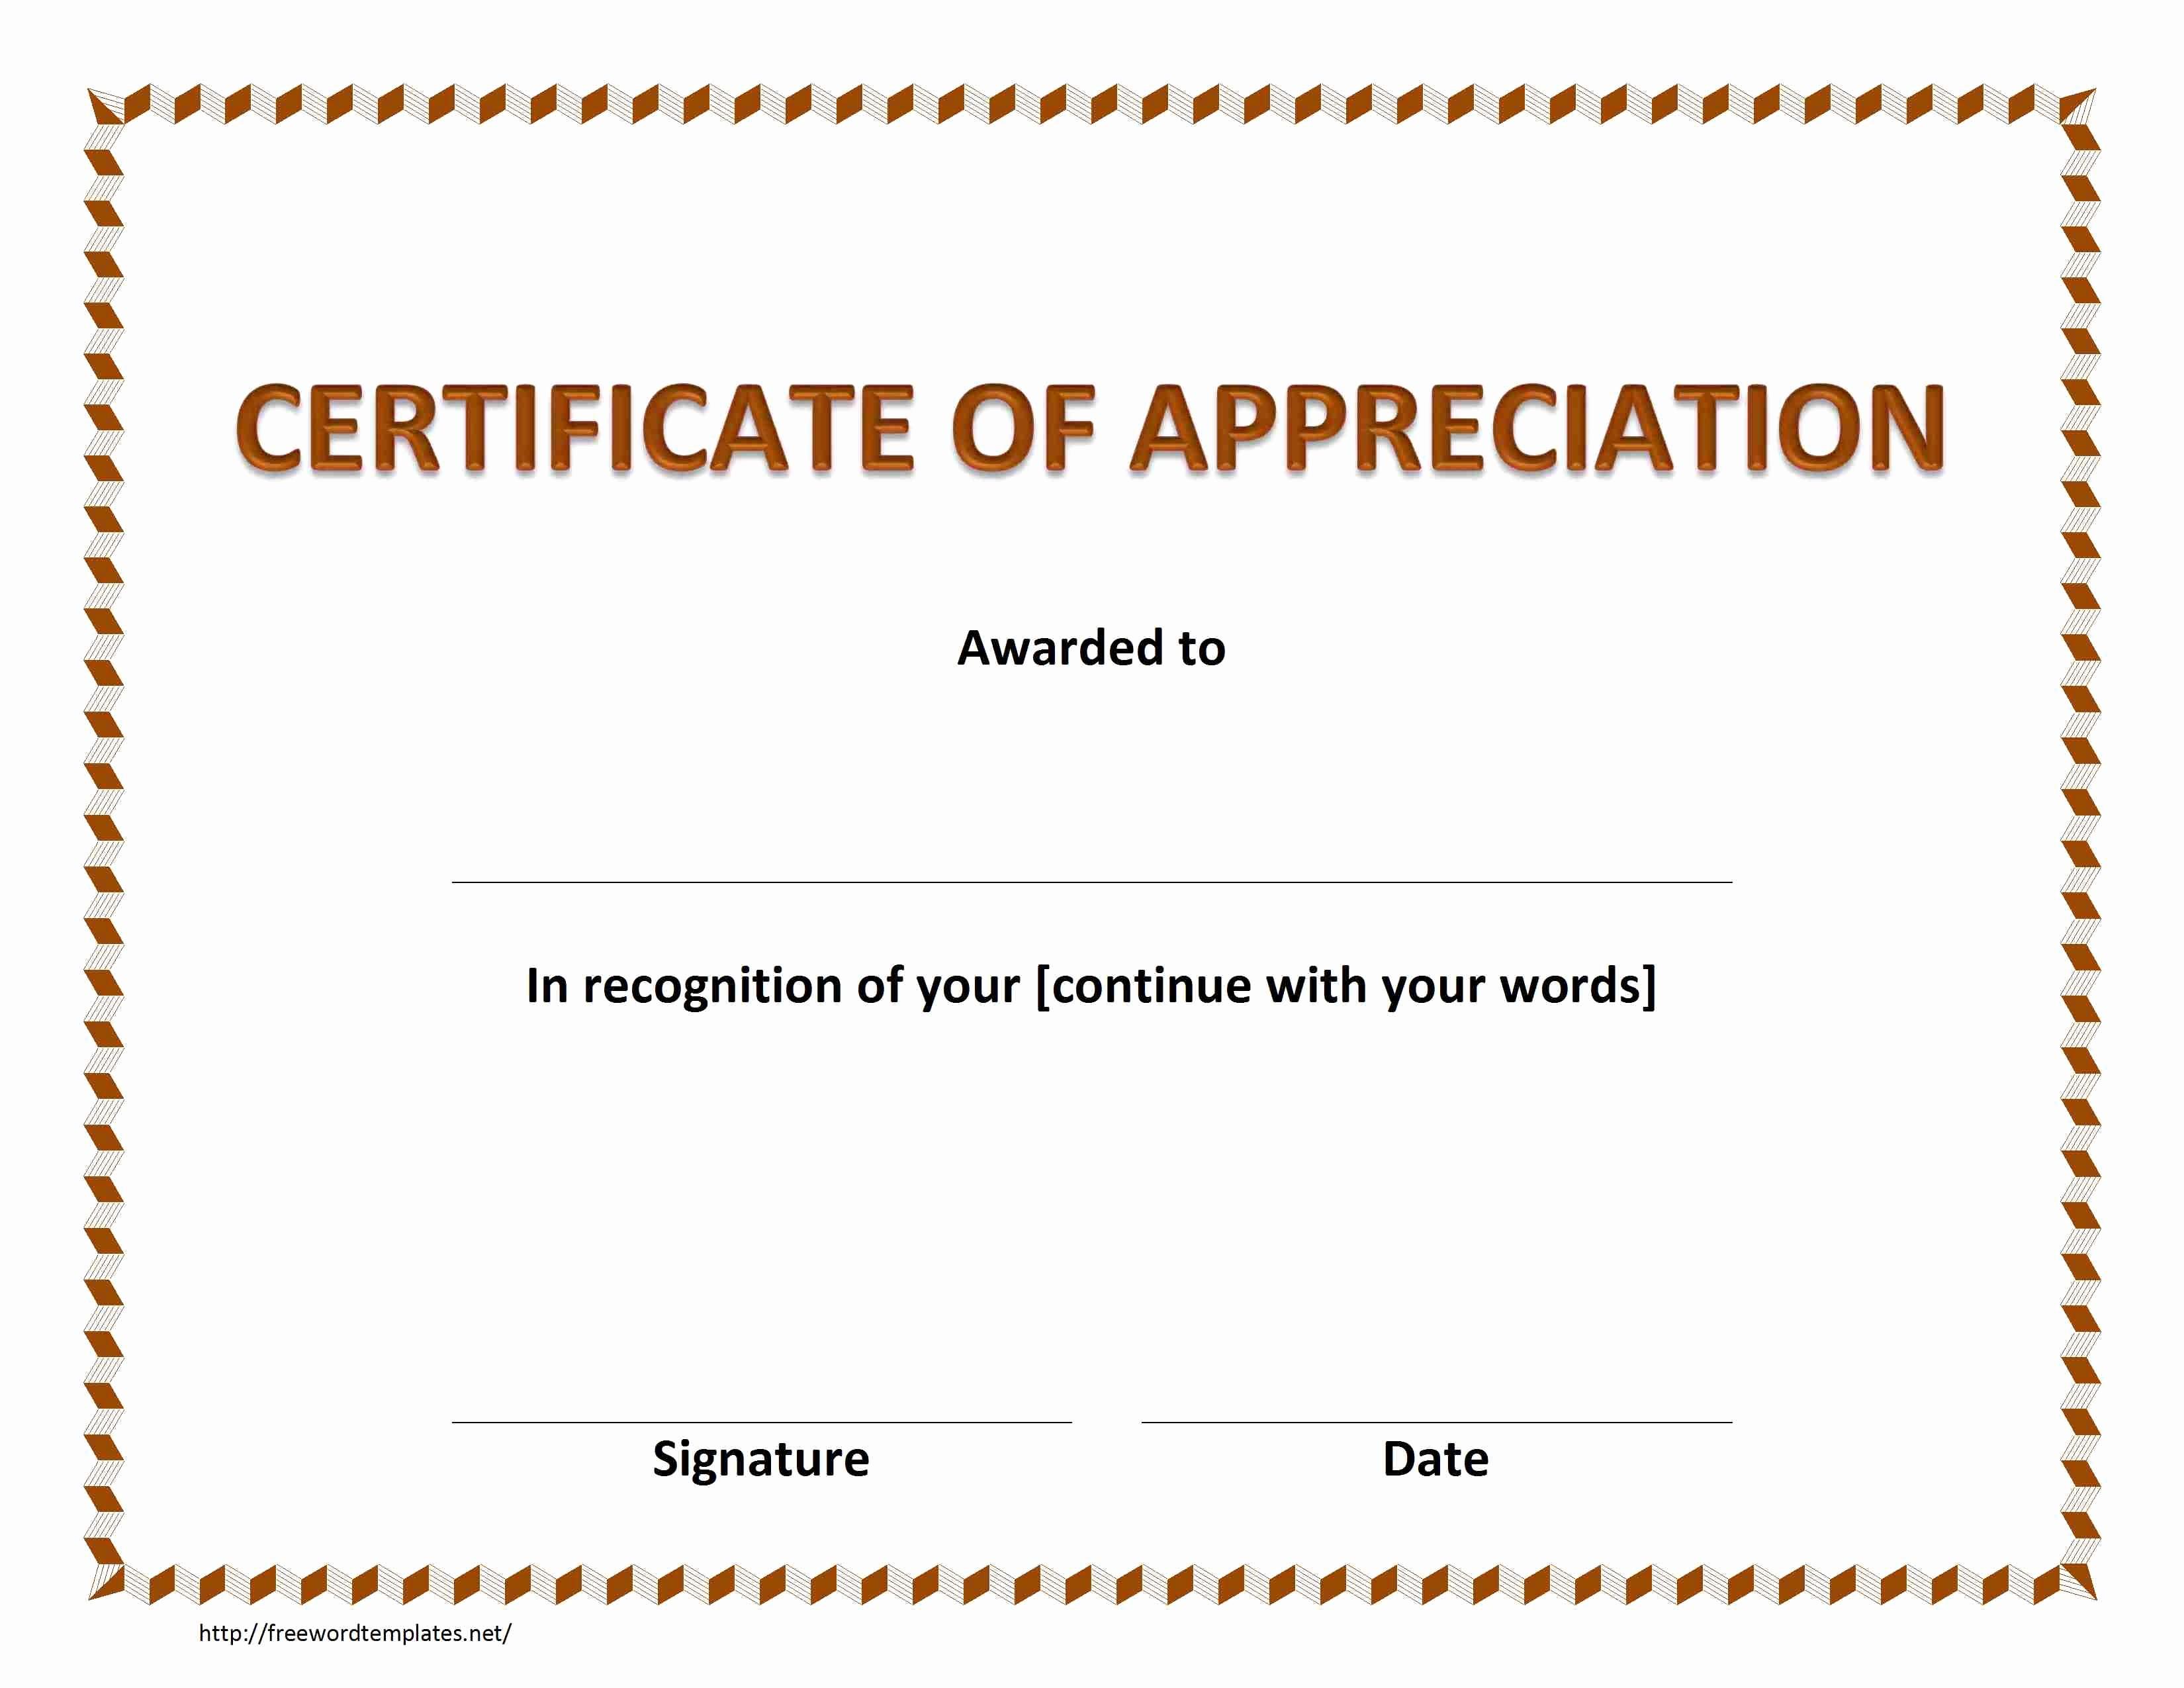 Template for Certificate Of Appreciation Luxury Certificate Of Appreciation